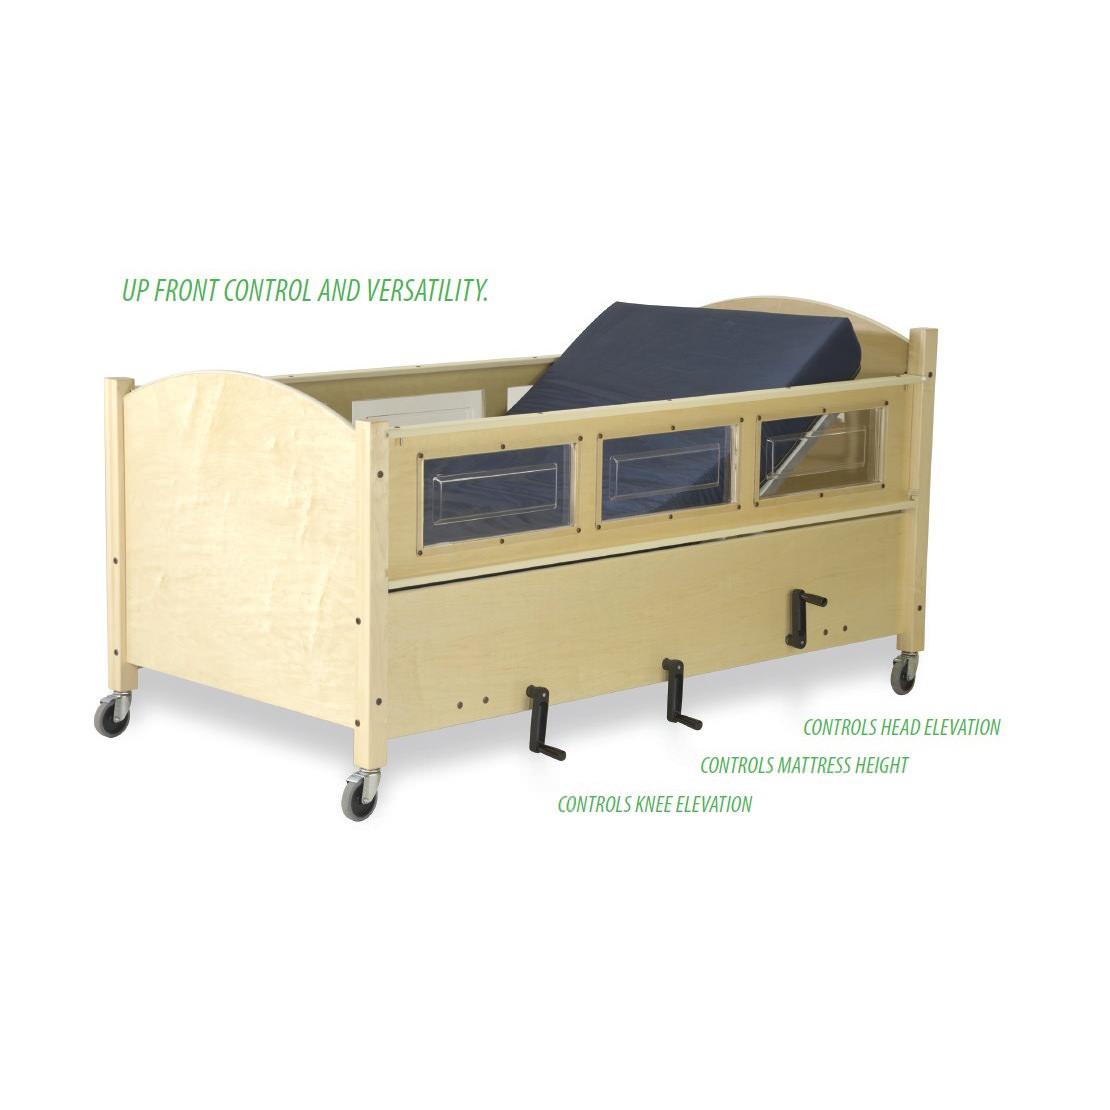 SleepSafer manual plus articulating tall bed